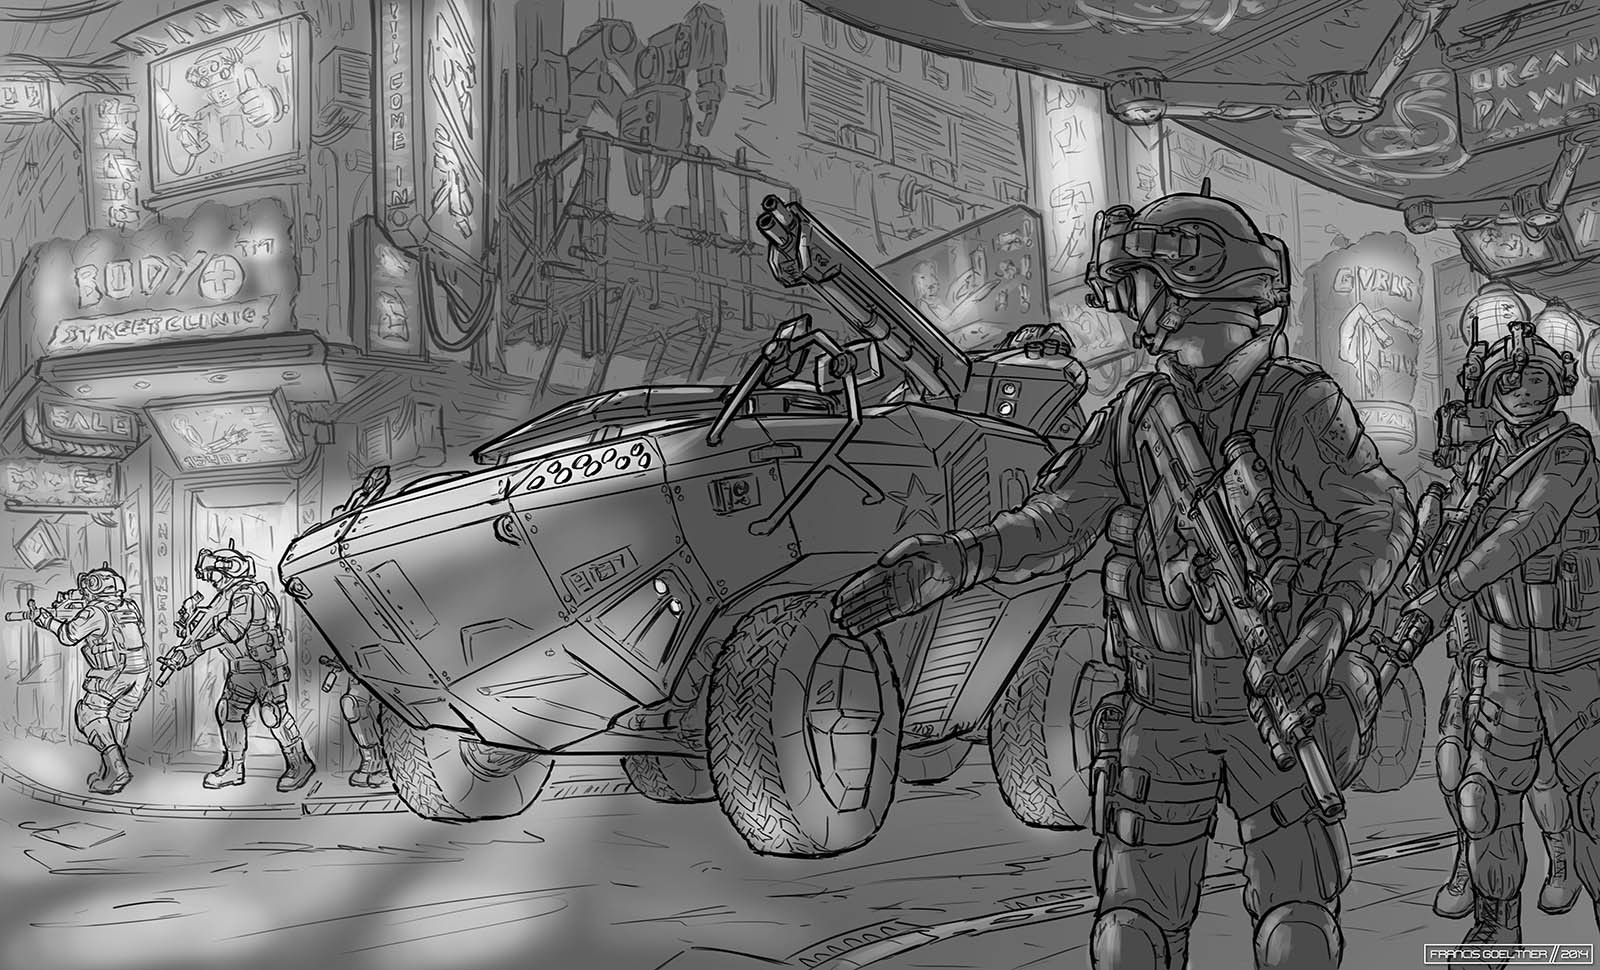 Preparation Sketch - Futuristic